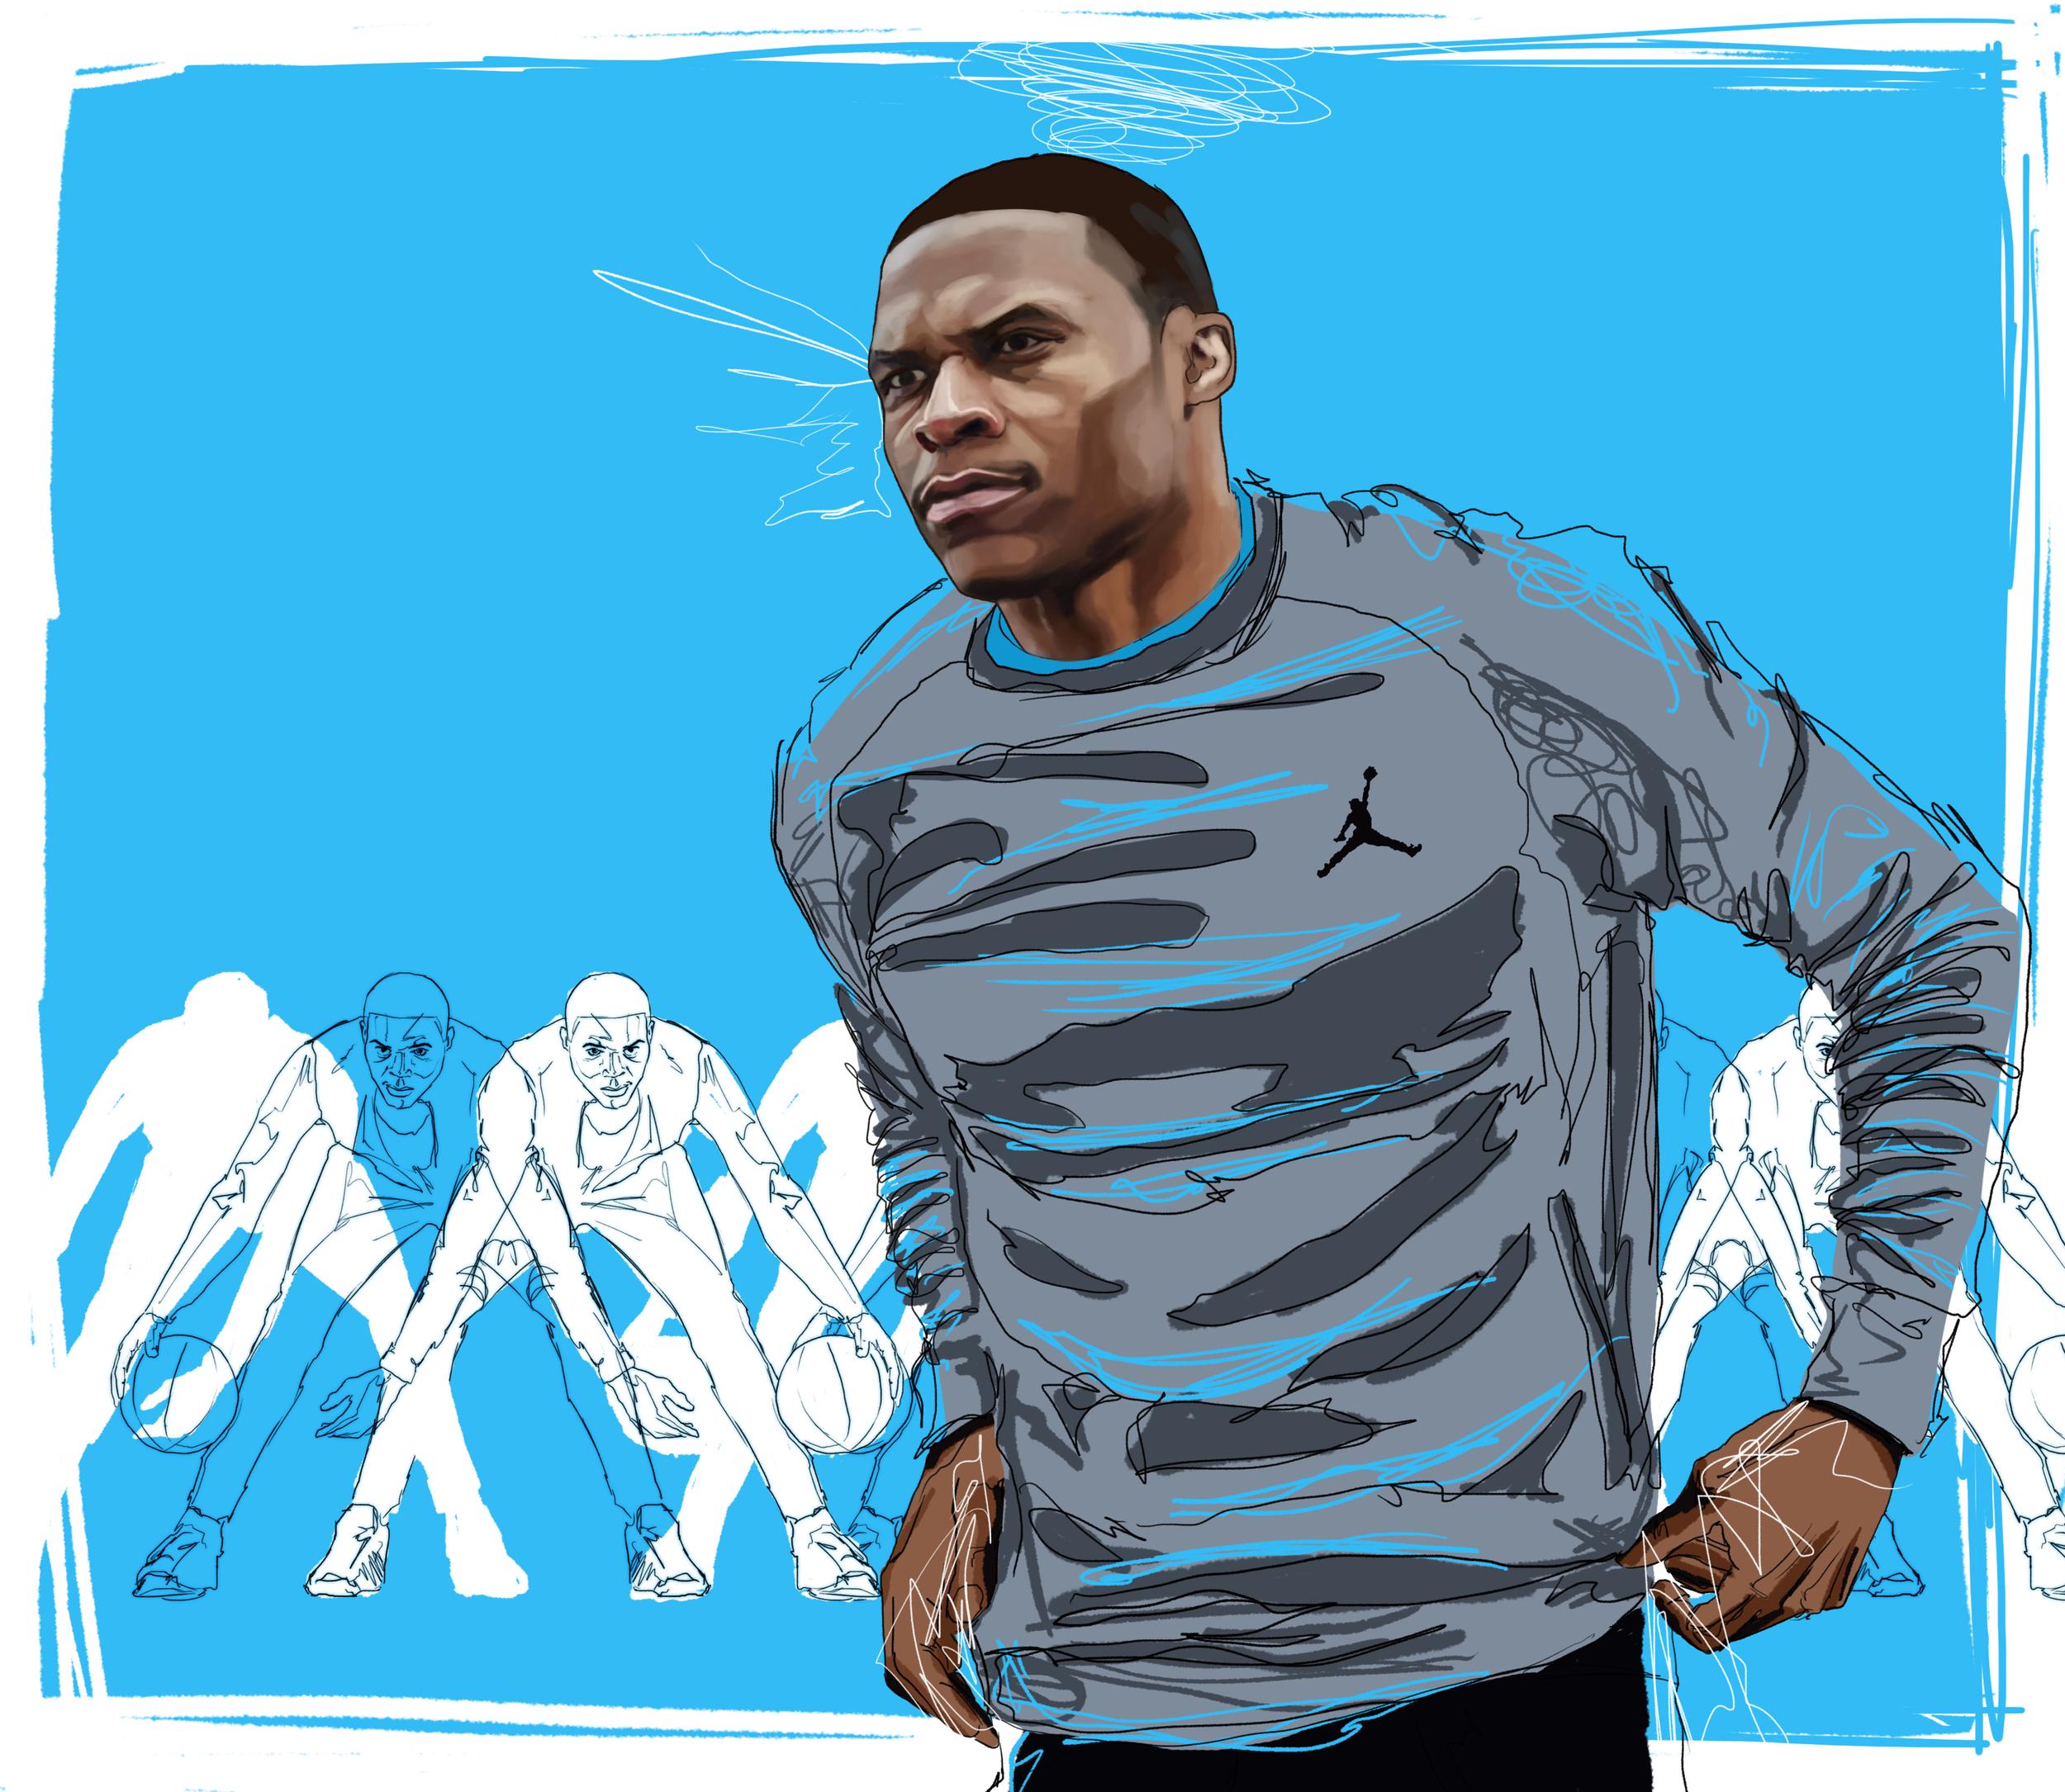 Russell Westbrook for Jordan Brand